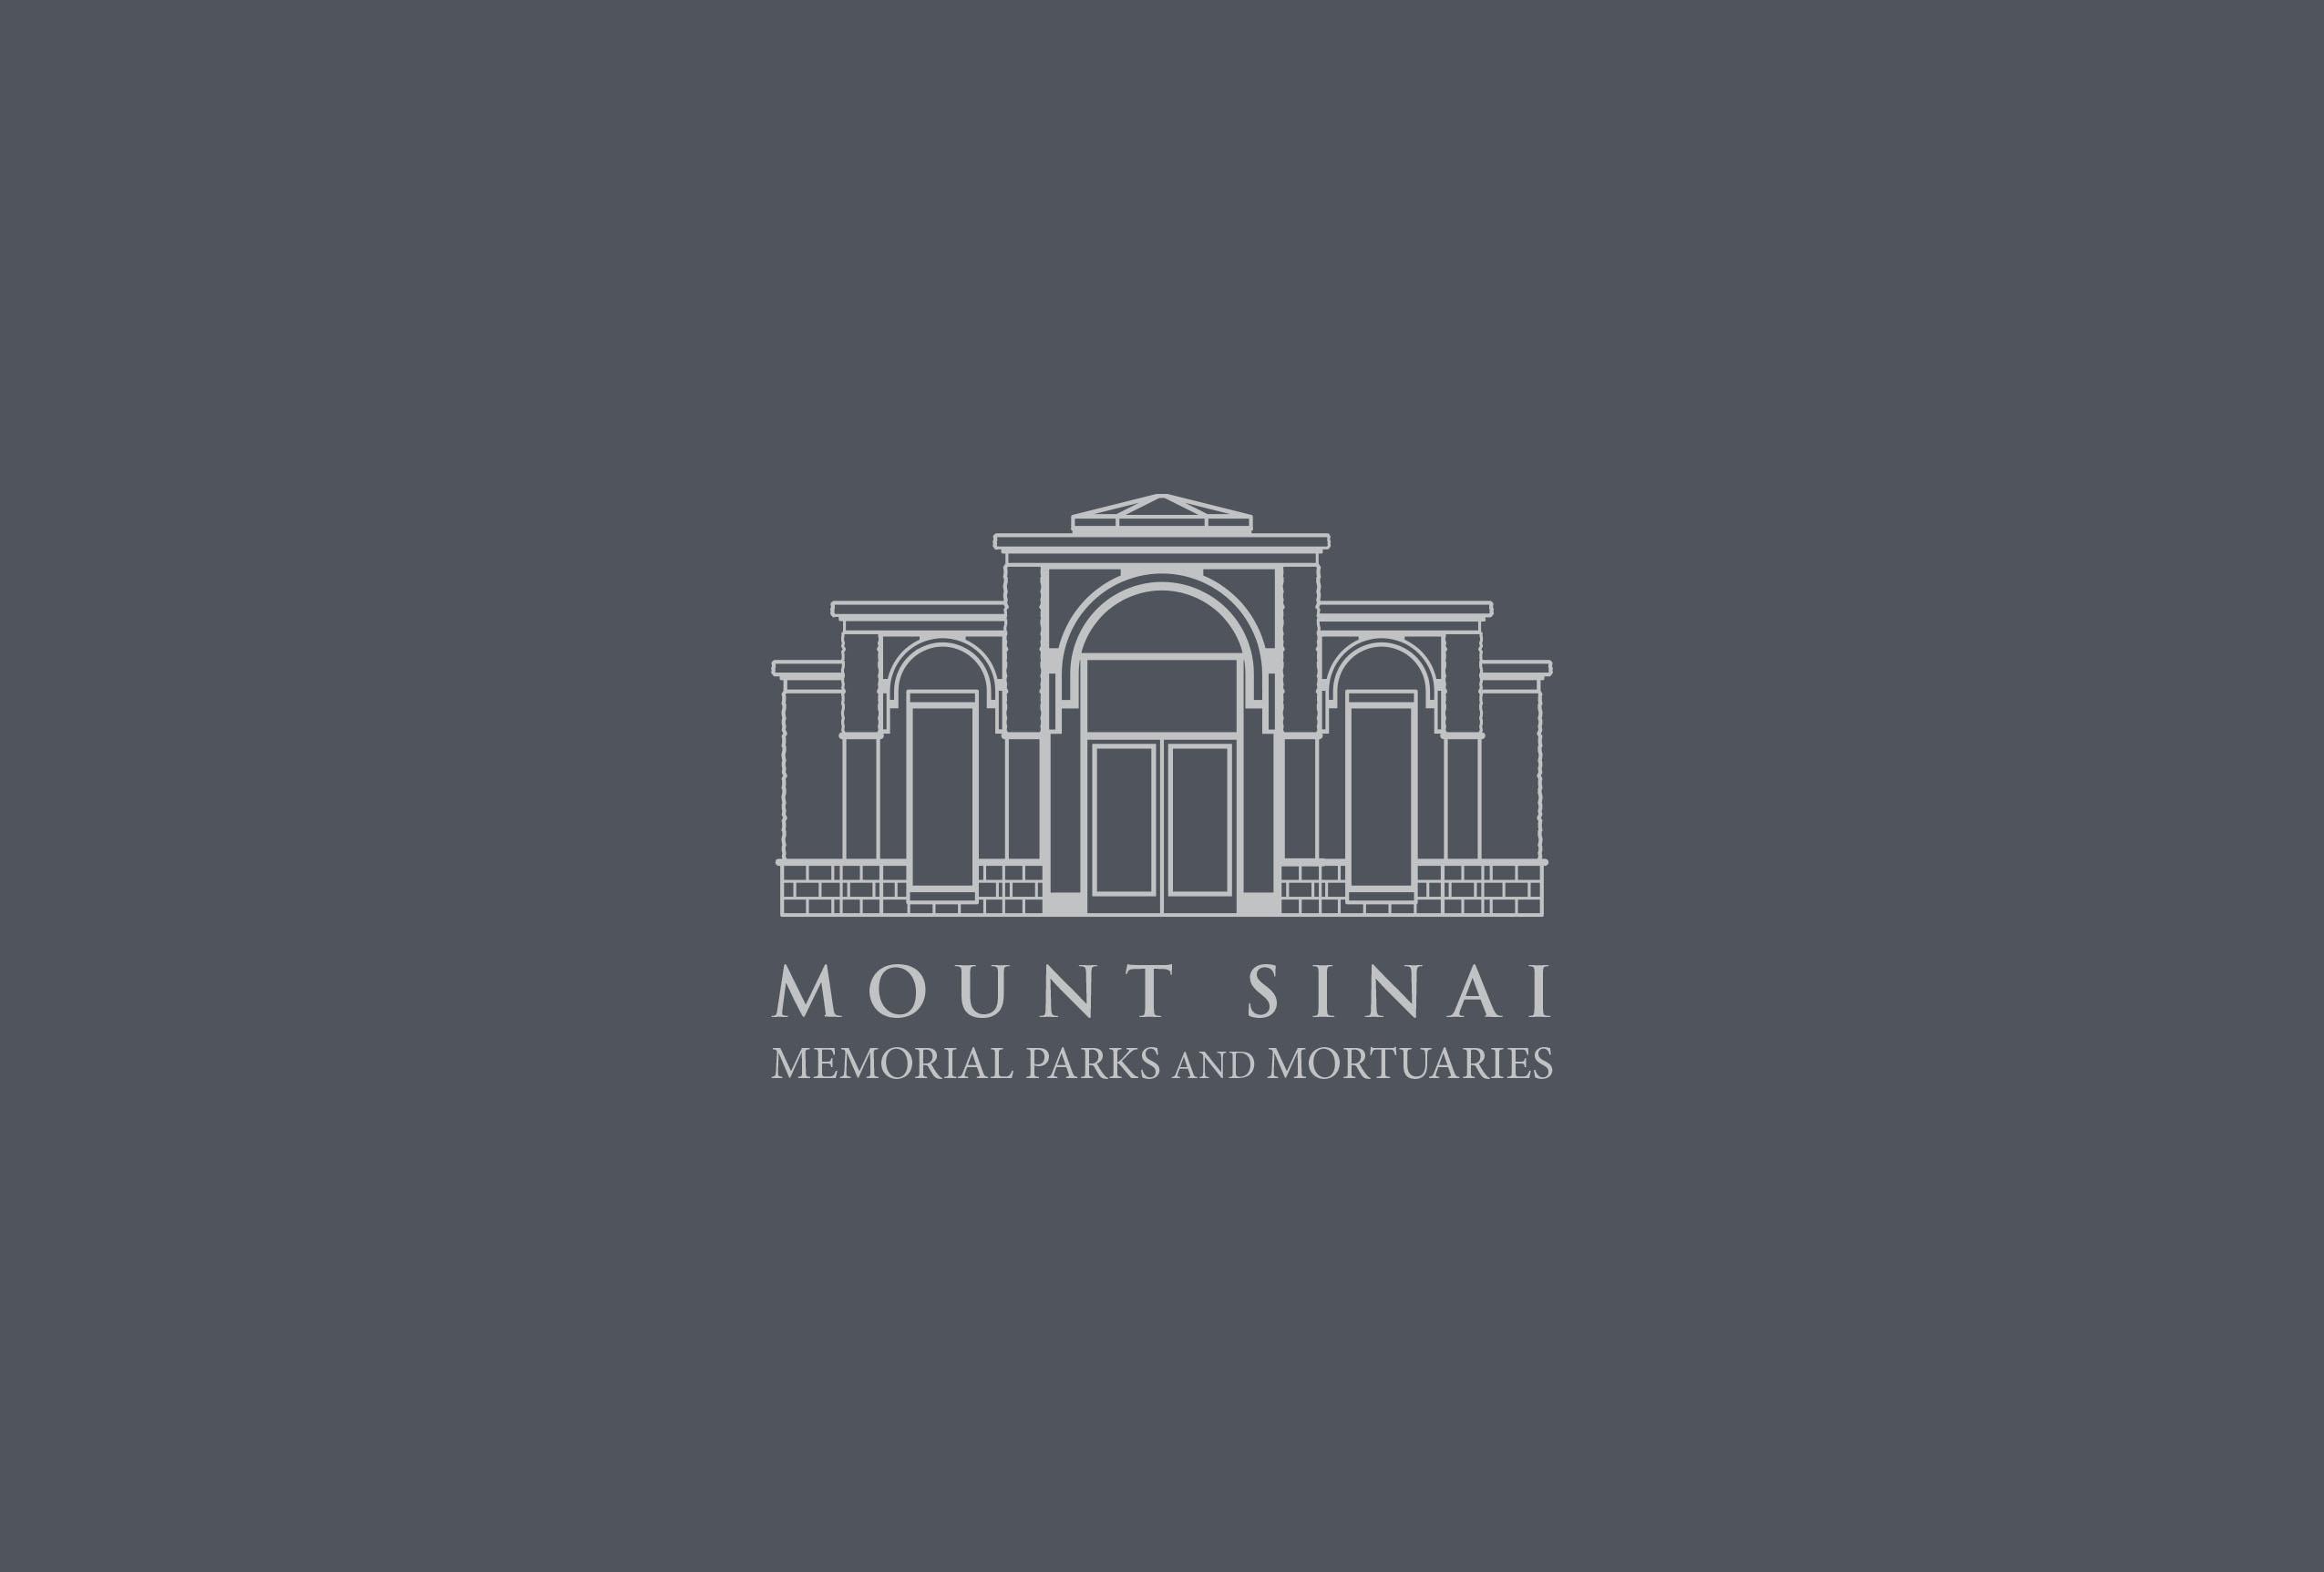 Mausoleum brochure cover